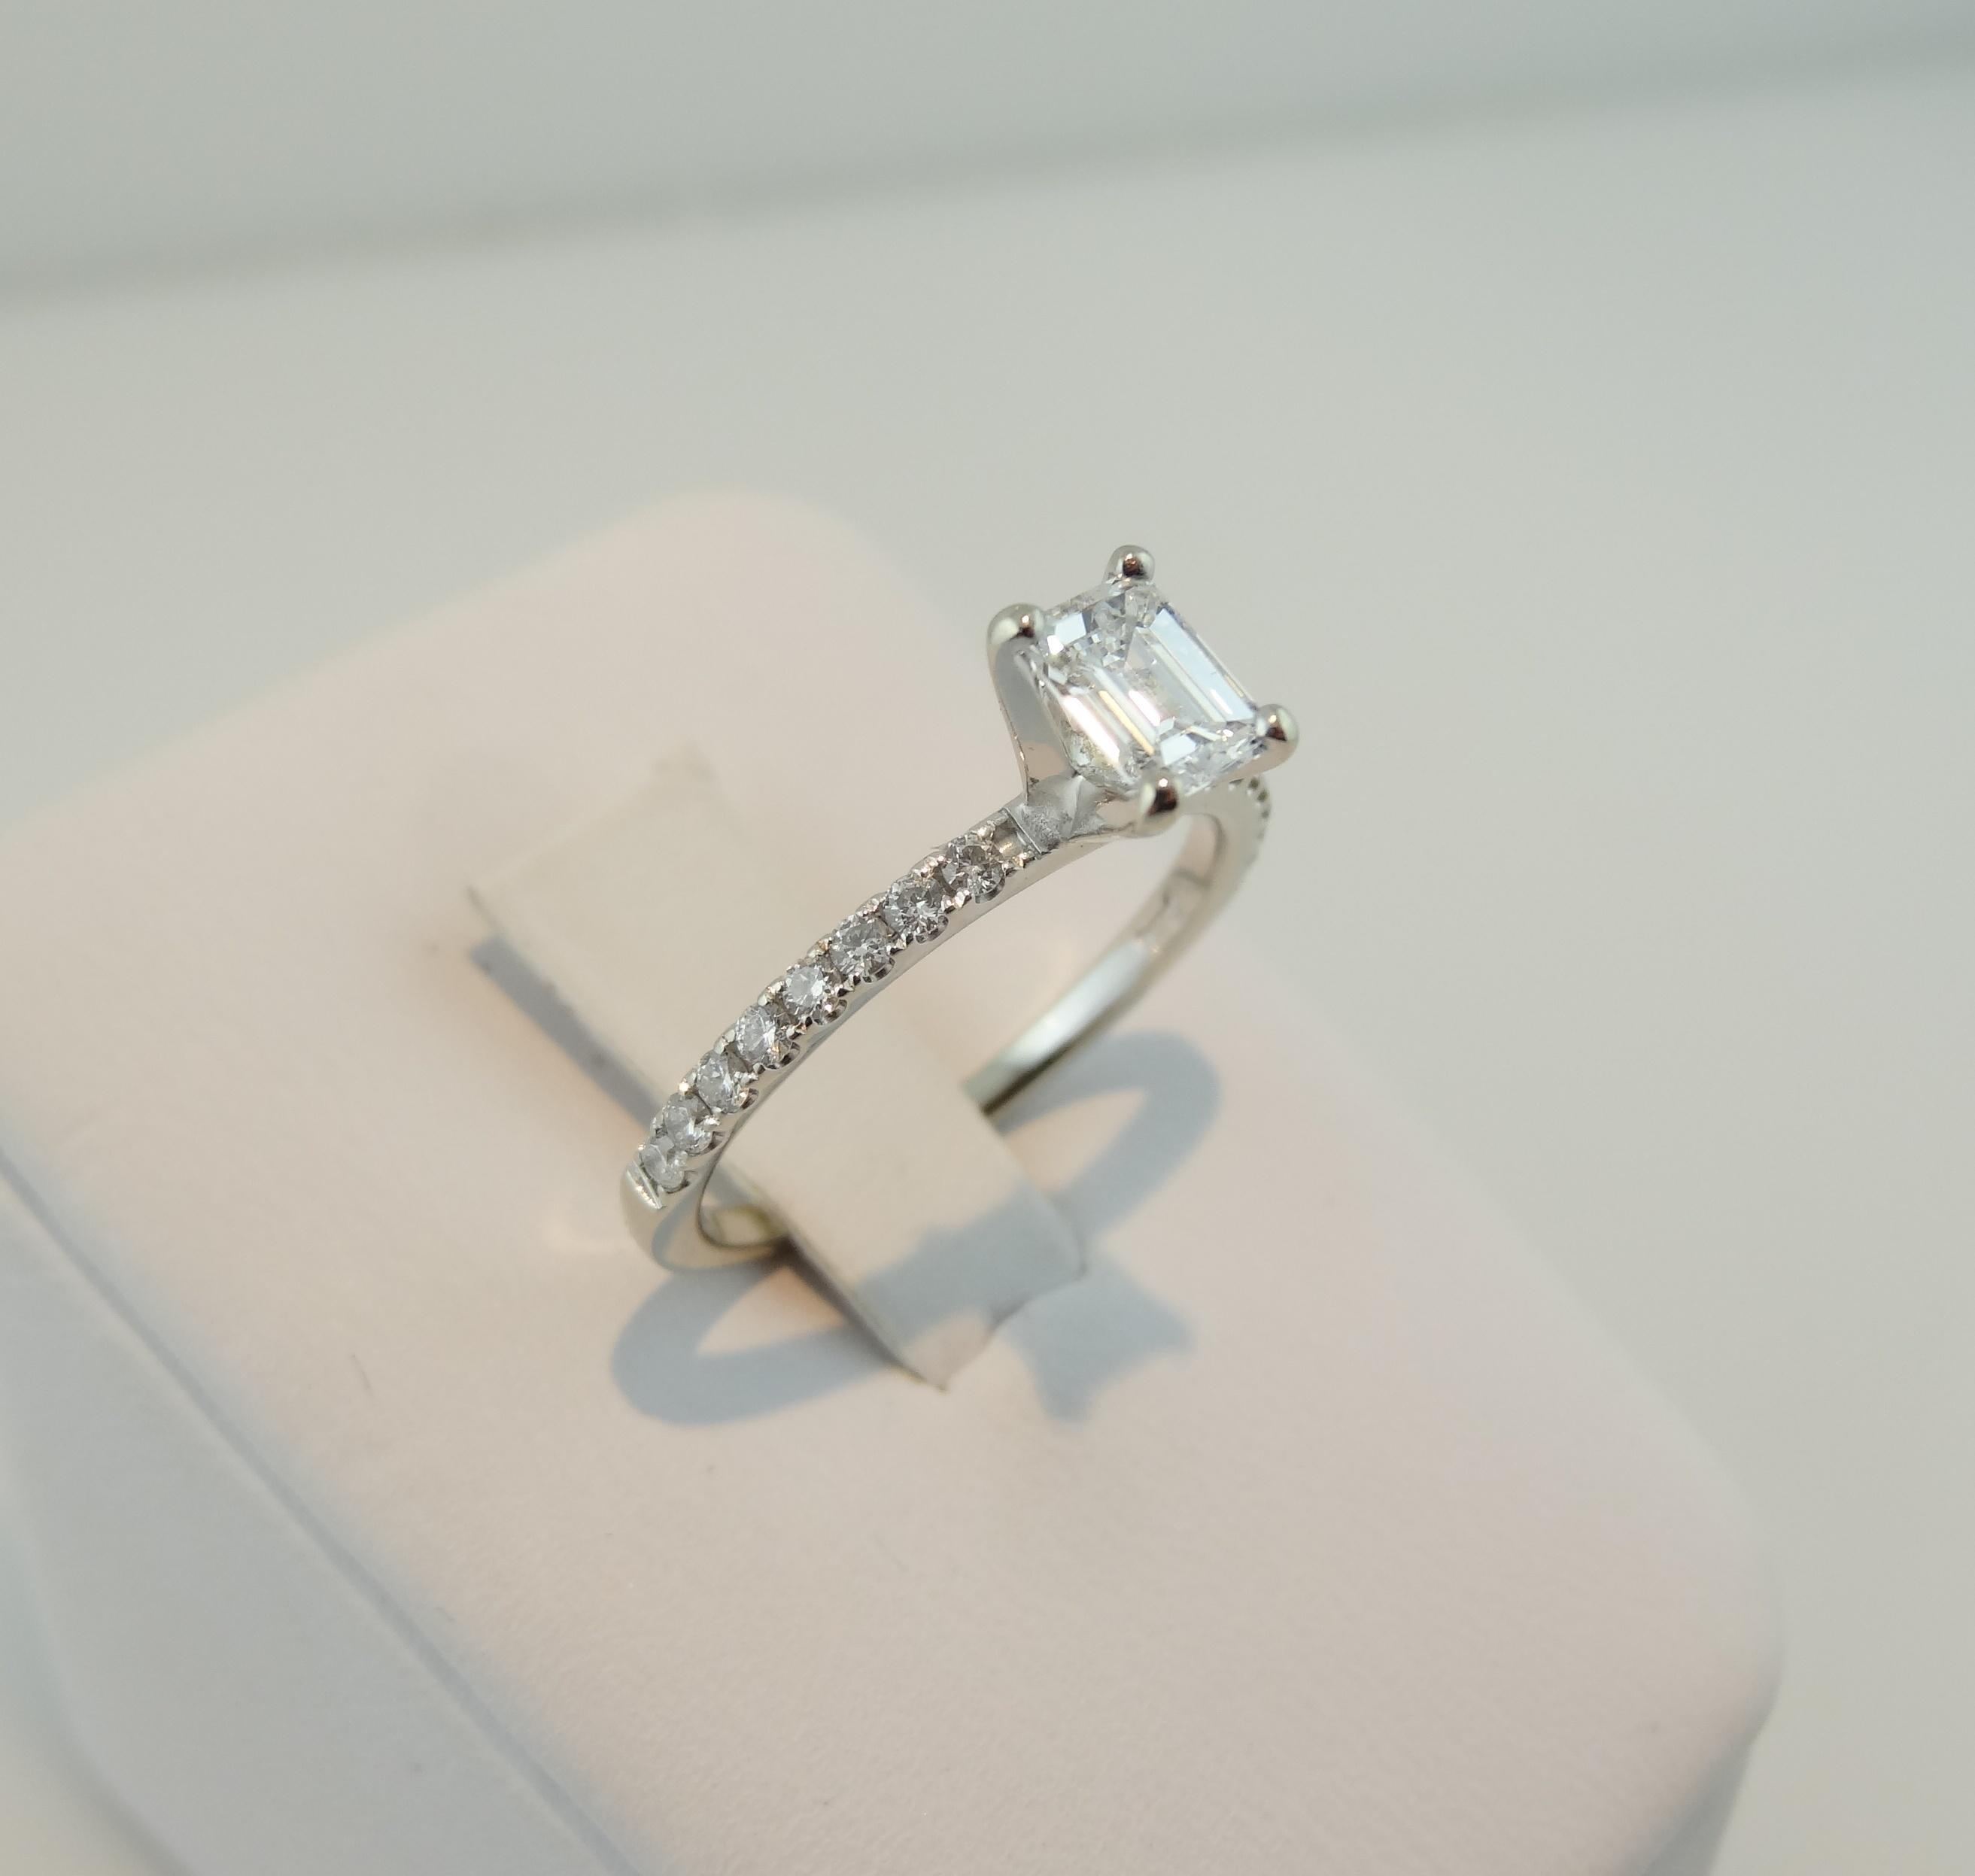 77c41f8b7faa22 2 Carat Emerald Cut Diamond Ring - New Image Ring Aintnoneed.Org